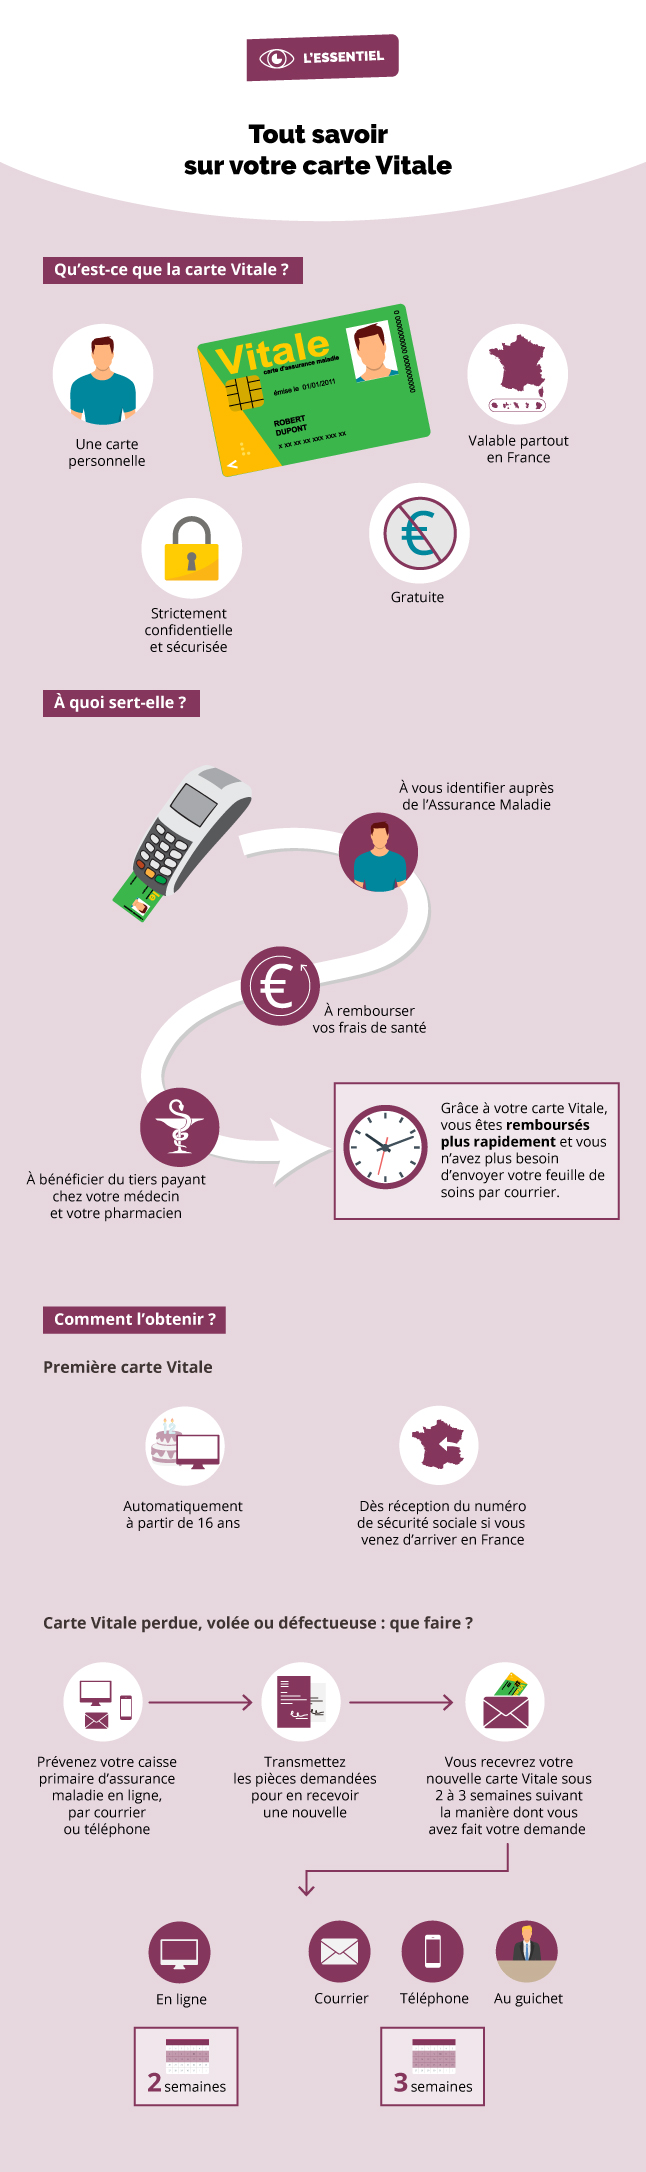 assurance maladie carte vitale La carte Vitale | ameli.fr | Assuré